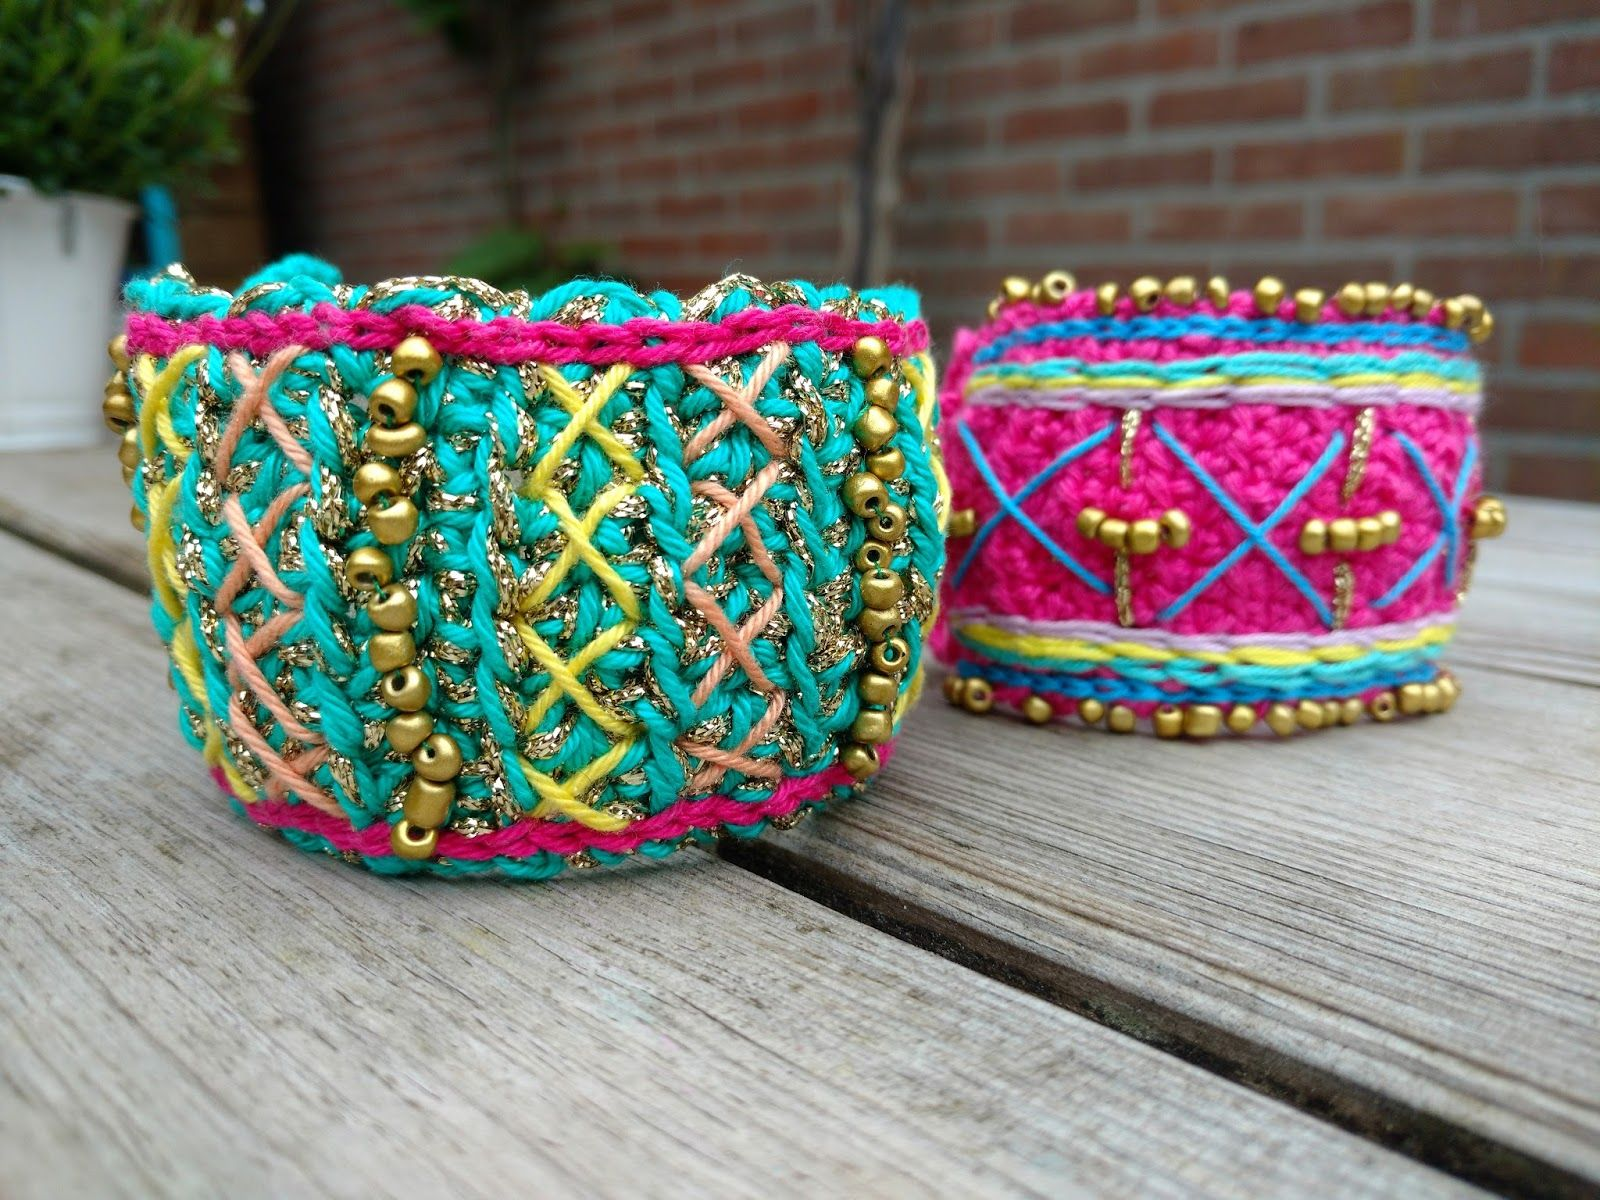 Immagine correlata | Crochet & Knitting | Pinterest | Crochet